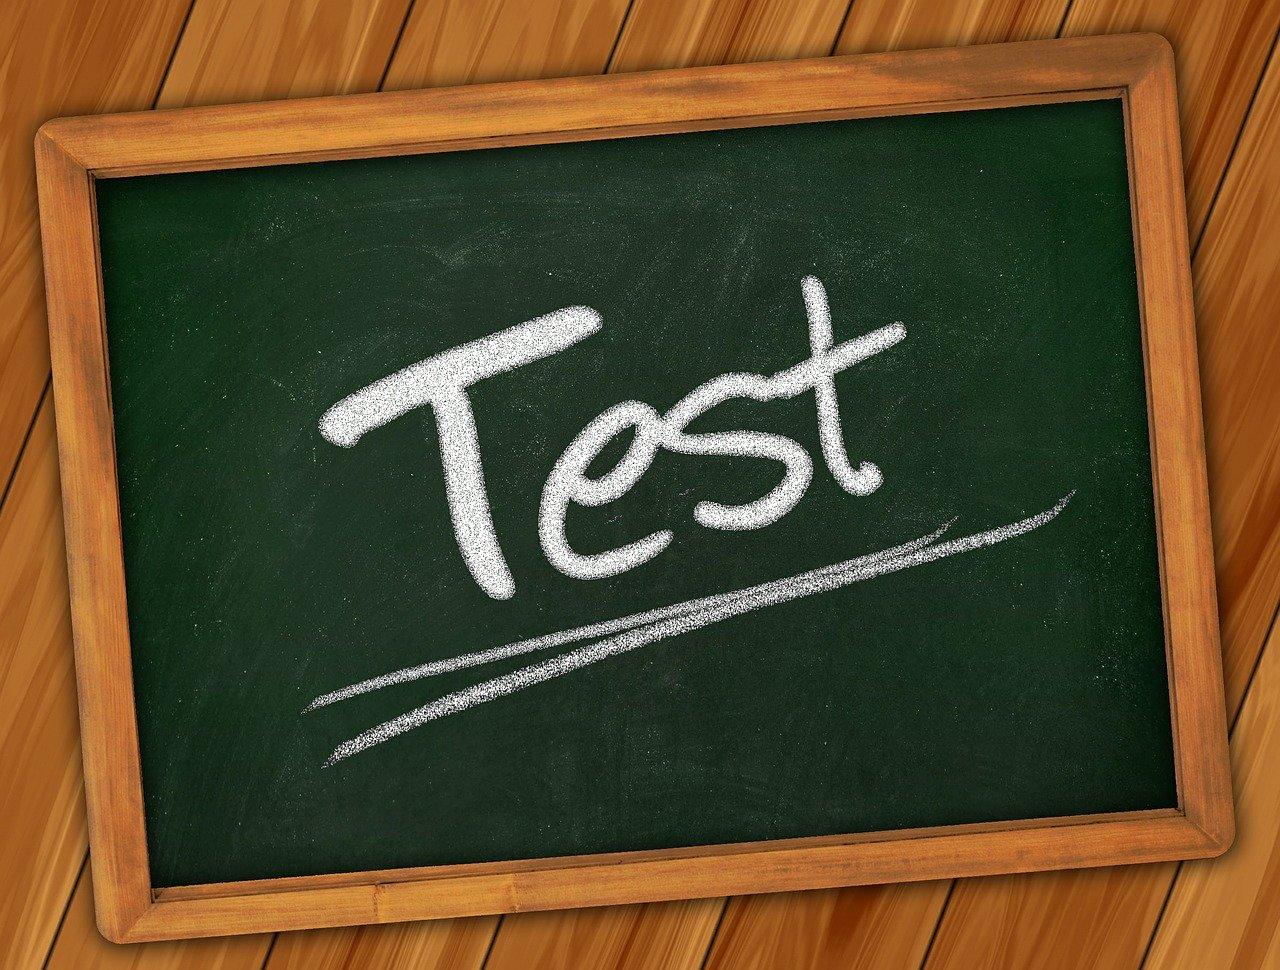 Amrita Vishwa Vidyapeetham Ph.D. Admission Test 2019 Registration Ongoing